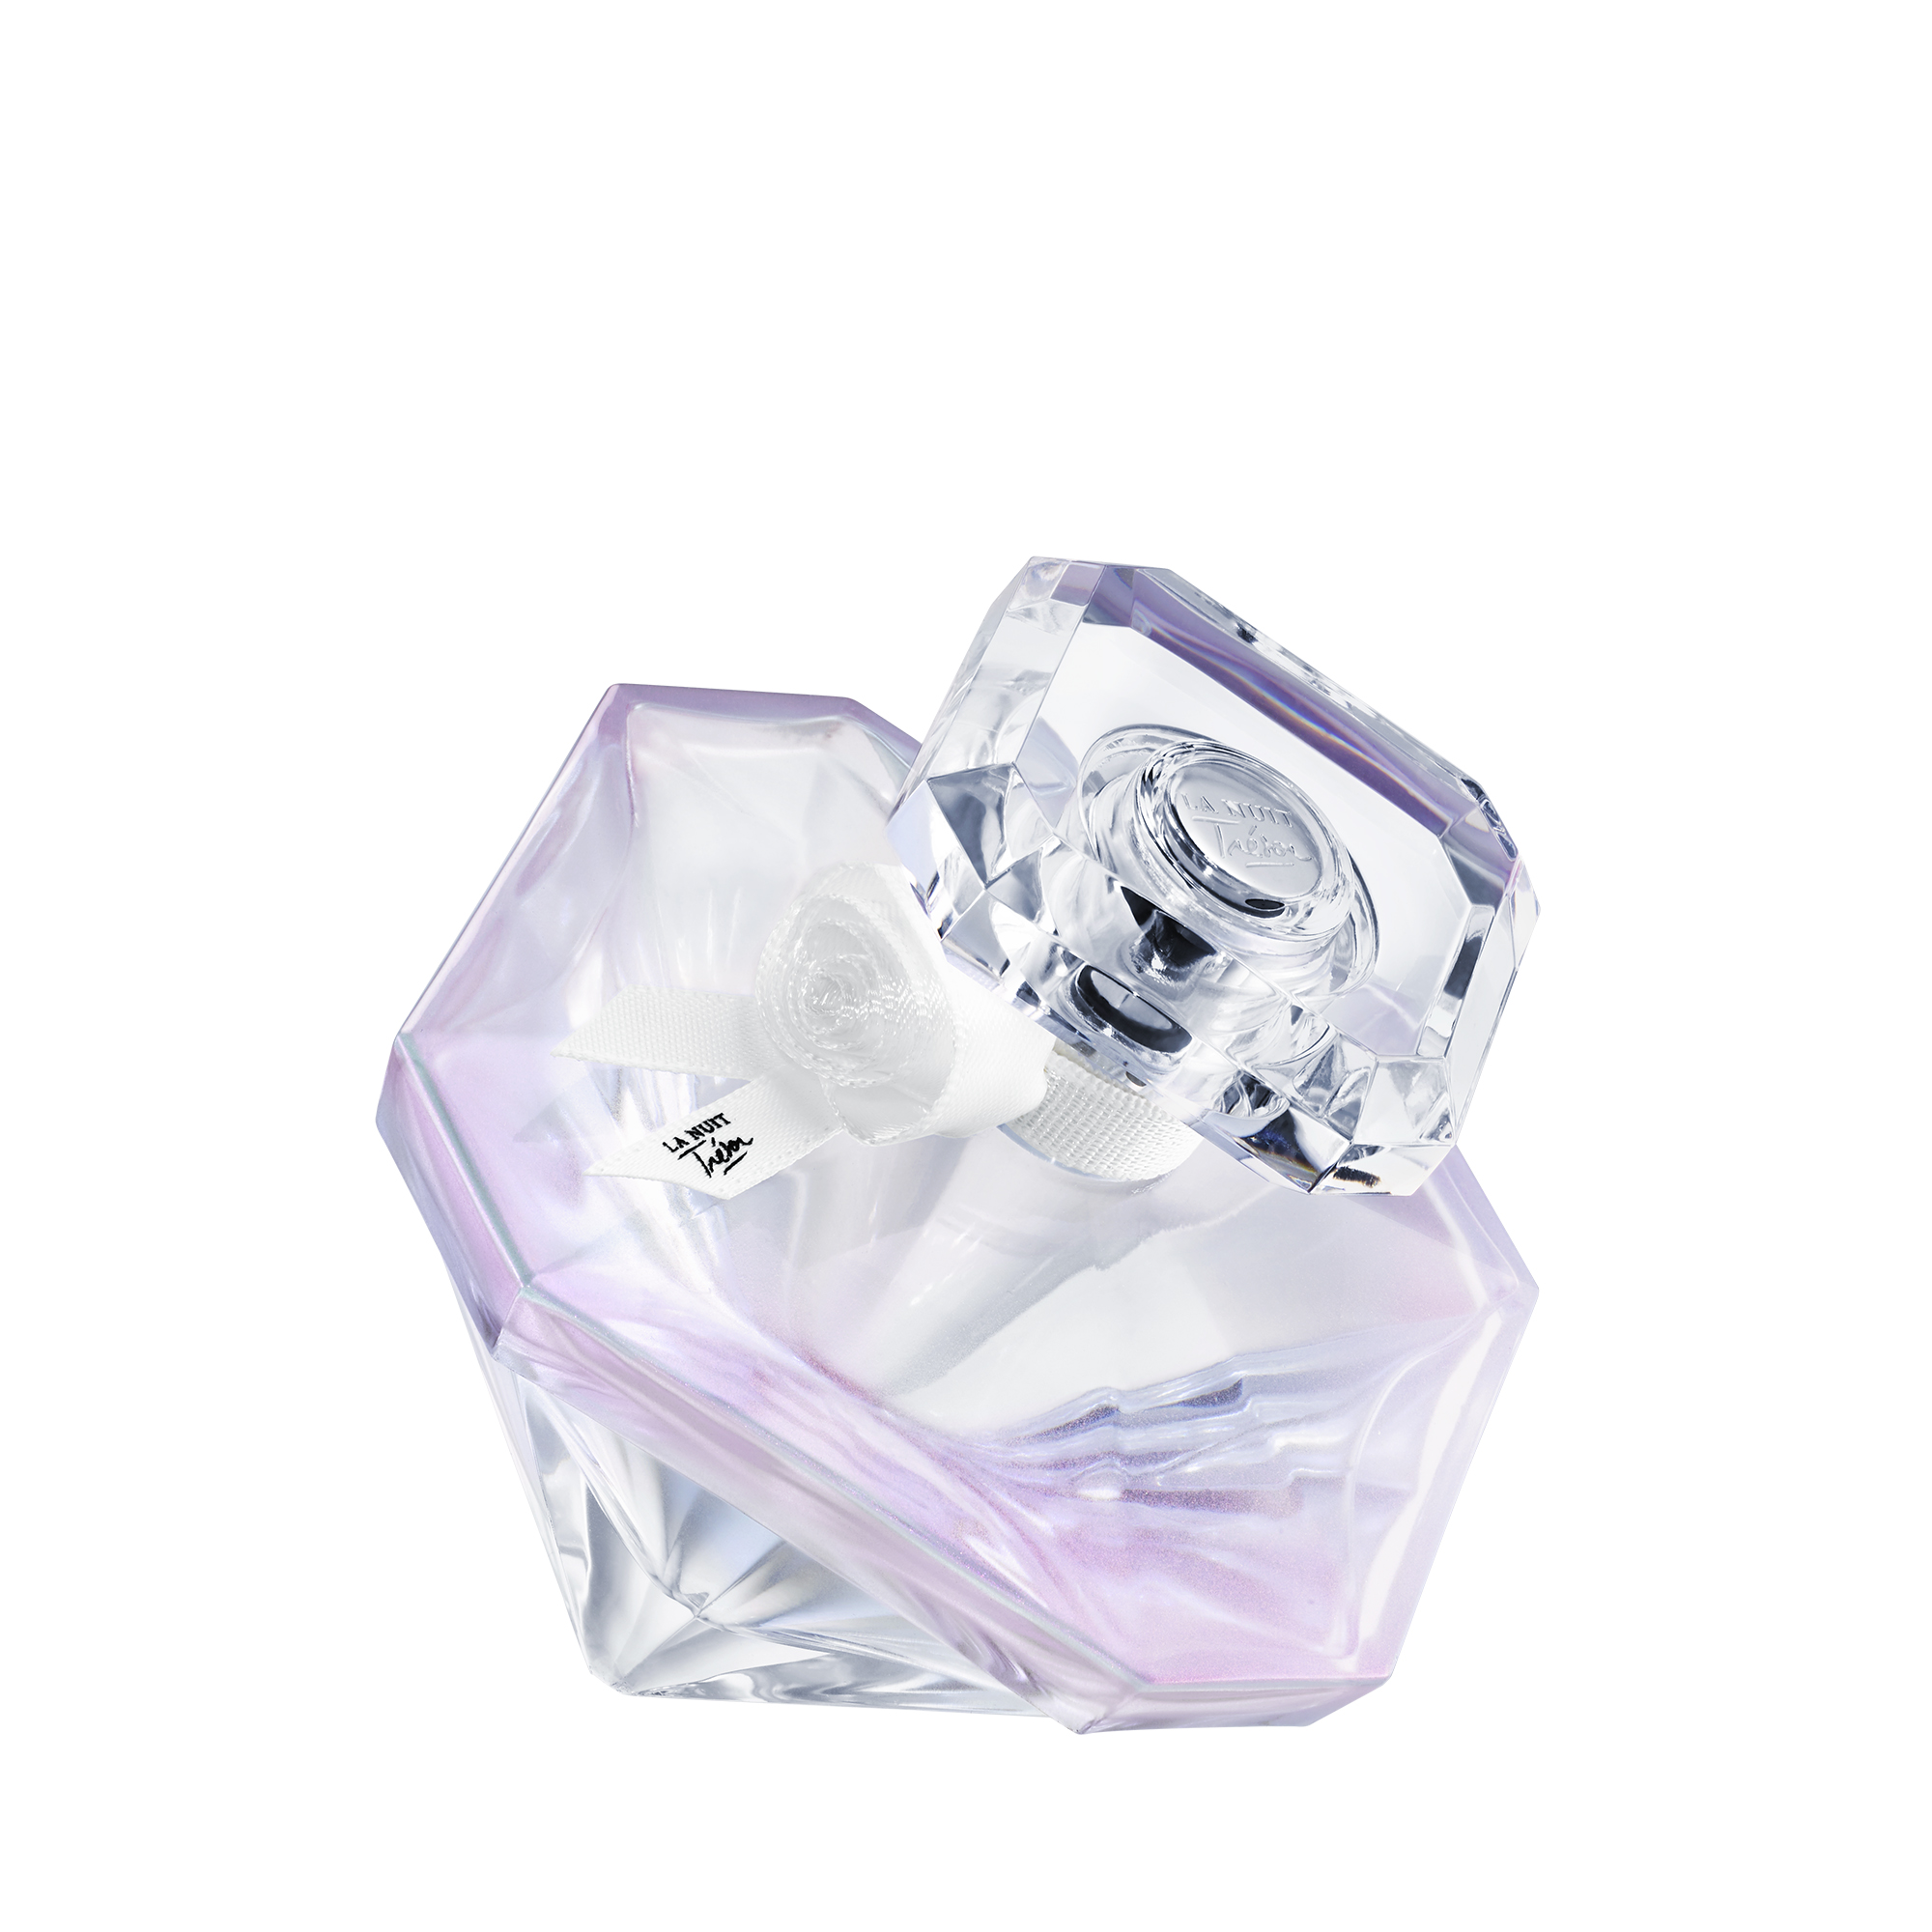 La Nuit Tresor Musc Diamant Edp